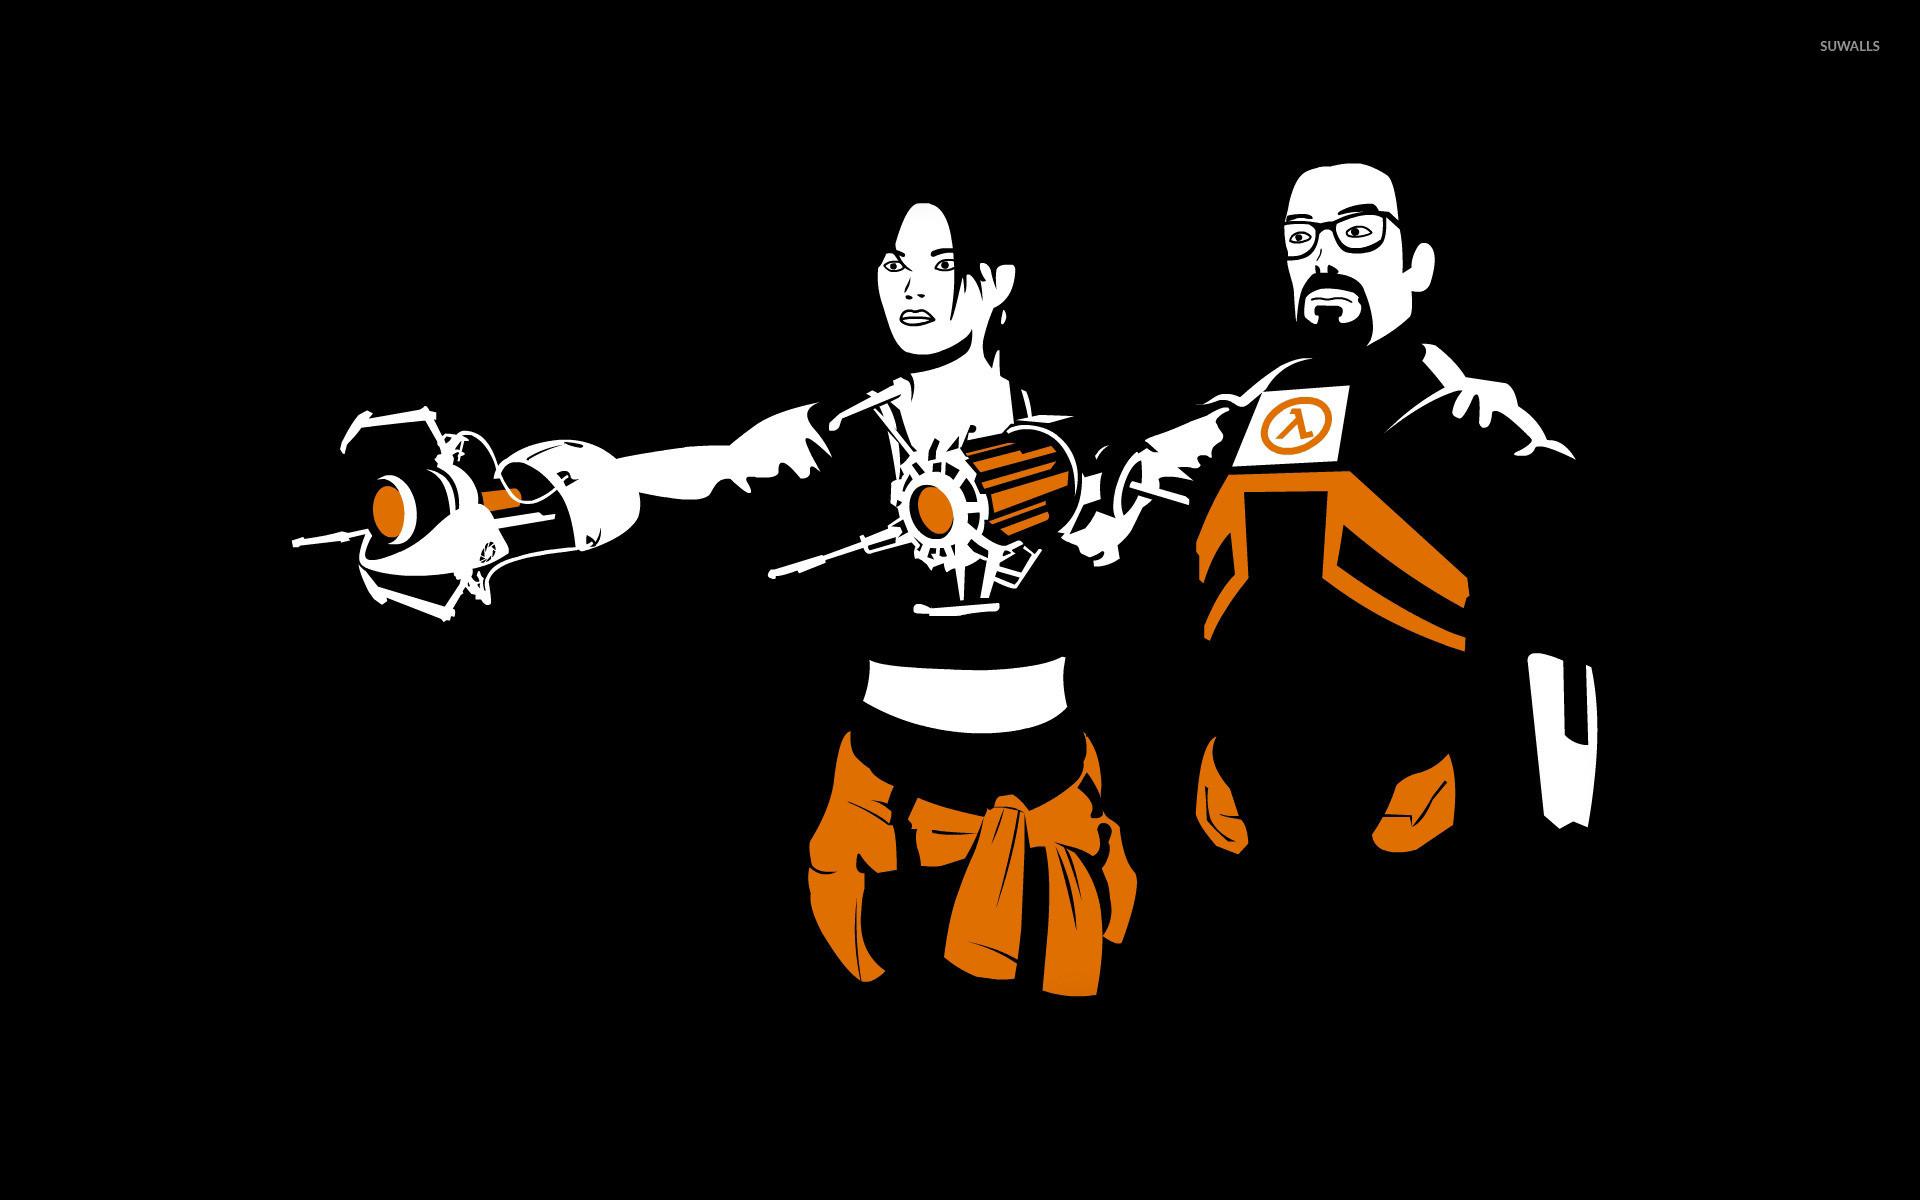 Alyx Vance and Gordon Freeman – Half-Life 2 wallpaper